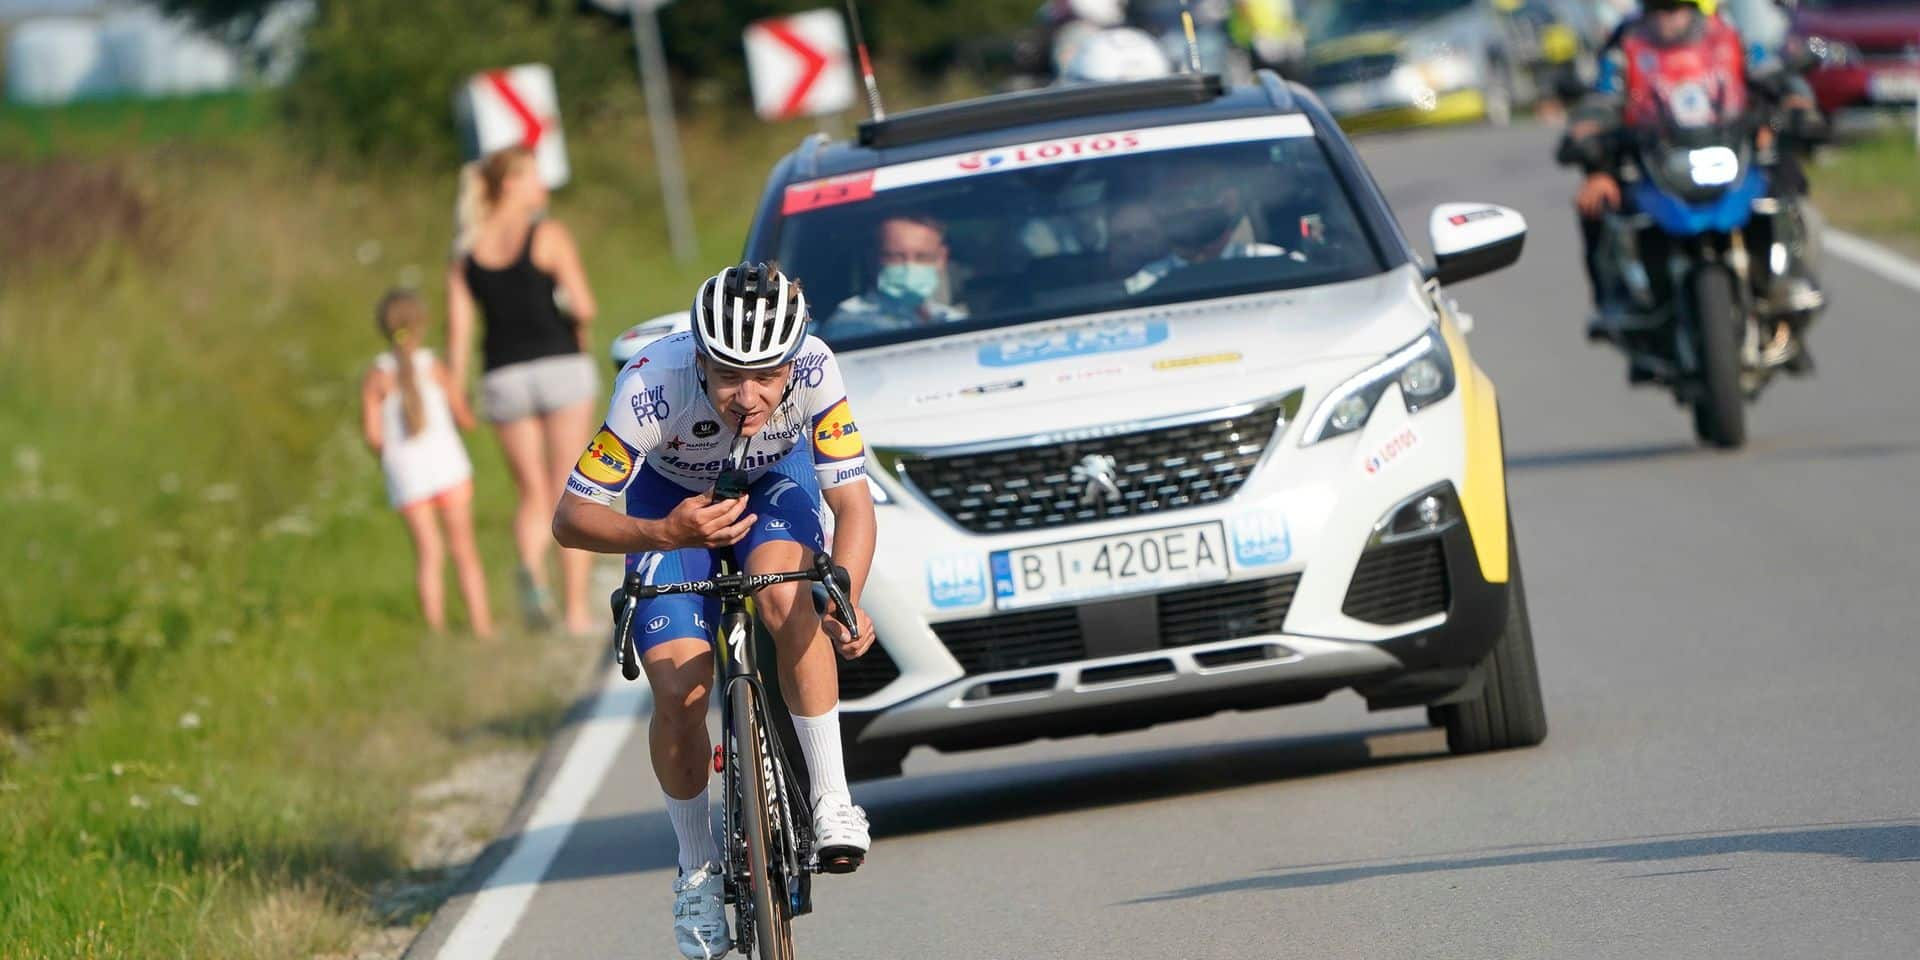 Tour de Lombardie: Remco Evenepoel grand favori pour succéder à Bauke Mollema